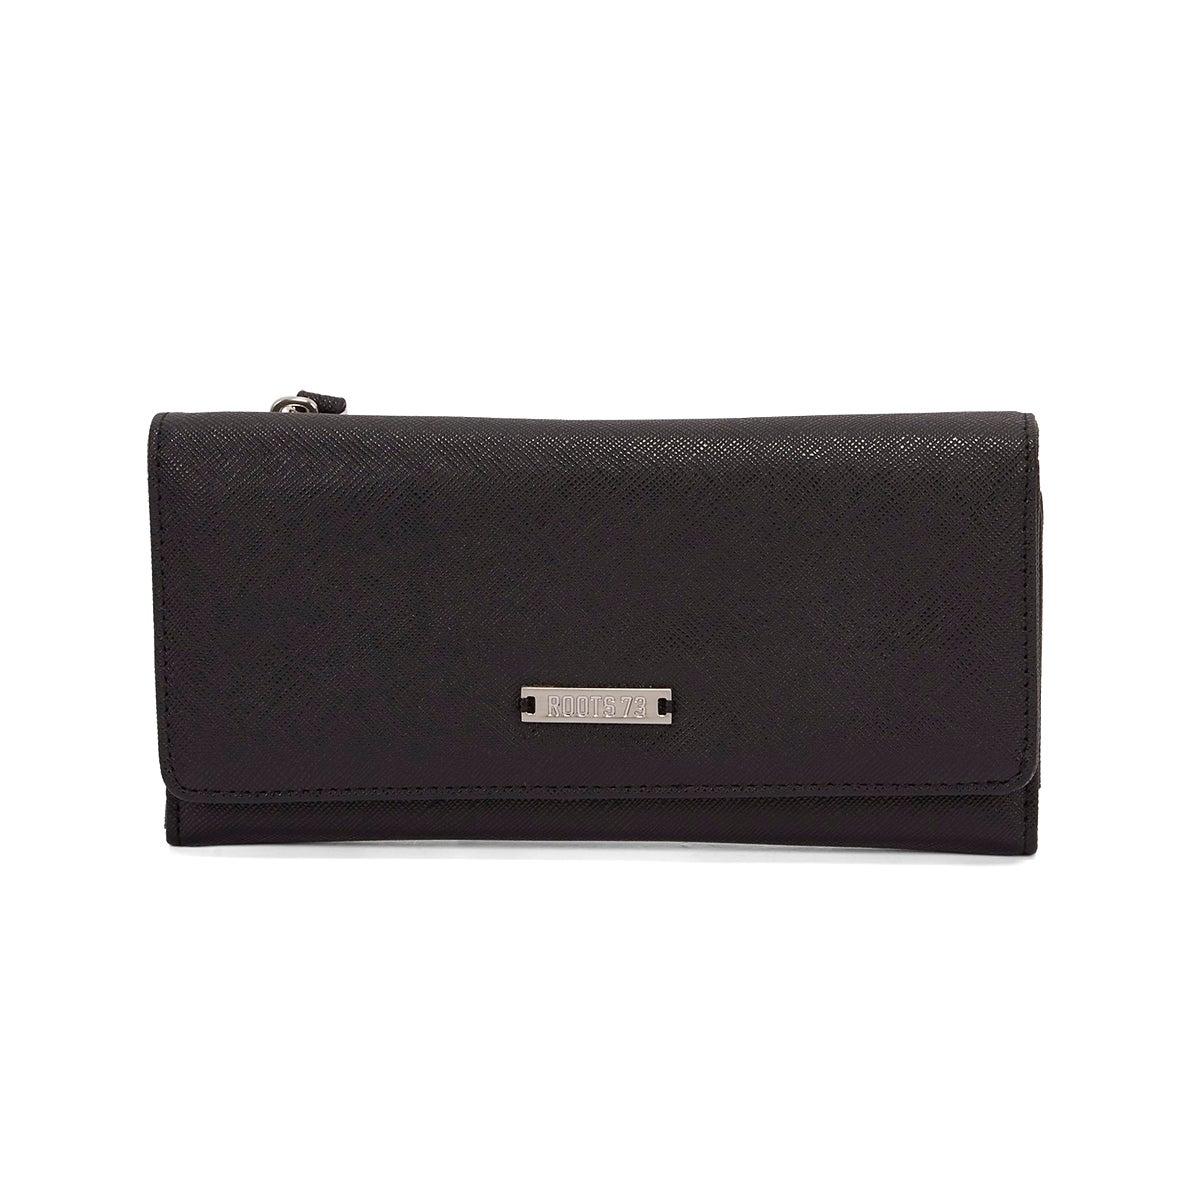 Lds Graphite black 3 fold large wallet